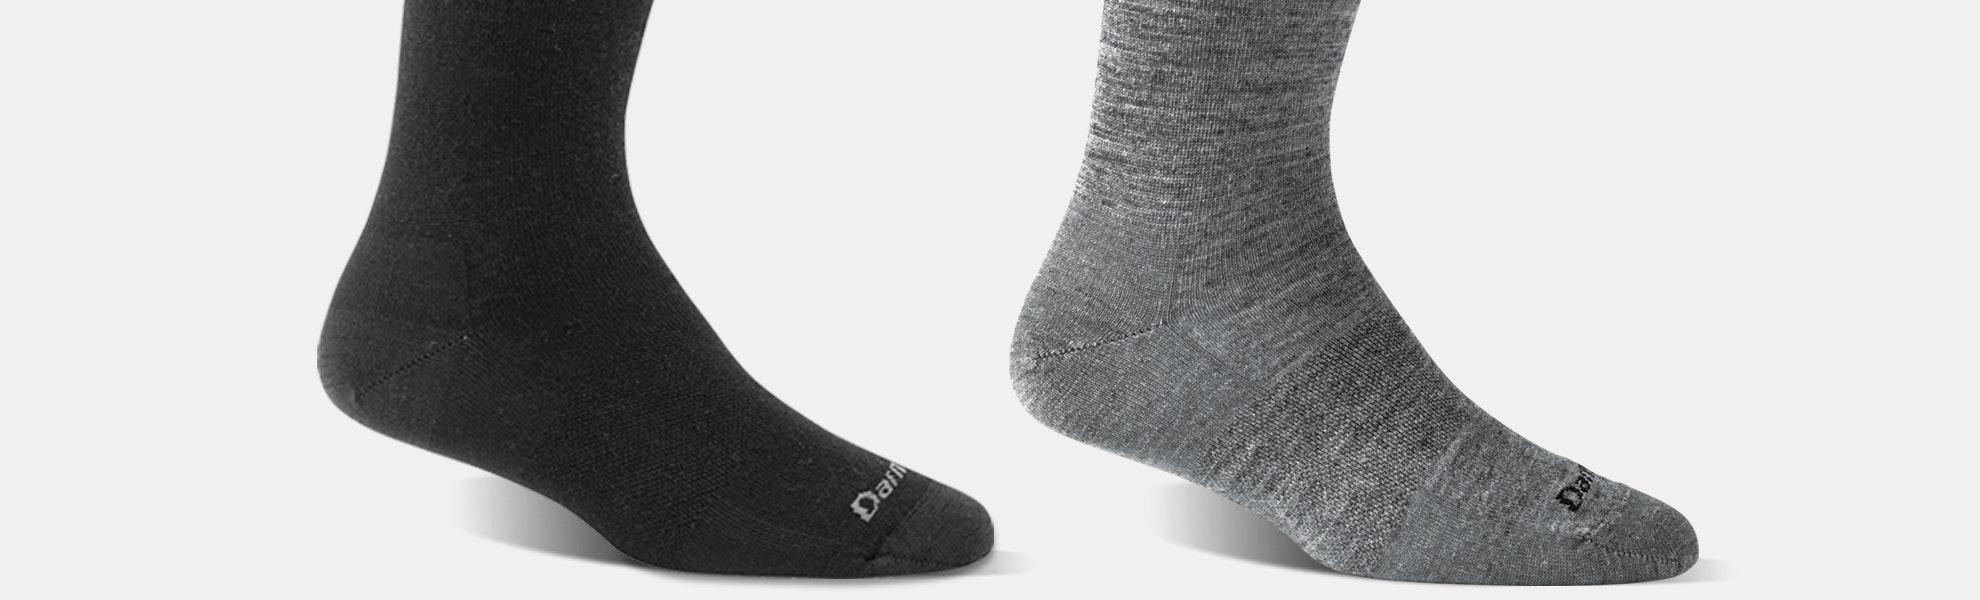 Darn Tough Lifestyle Socks (2-Pack)